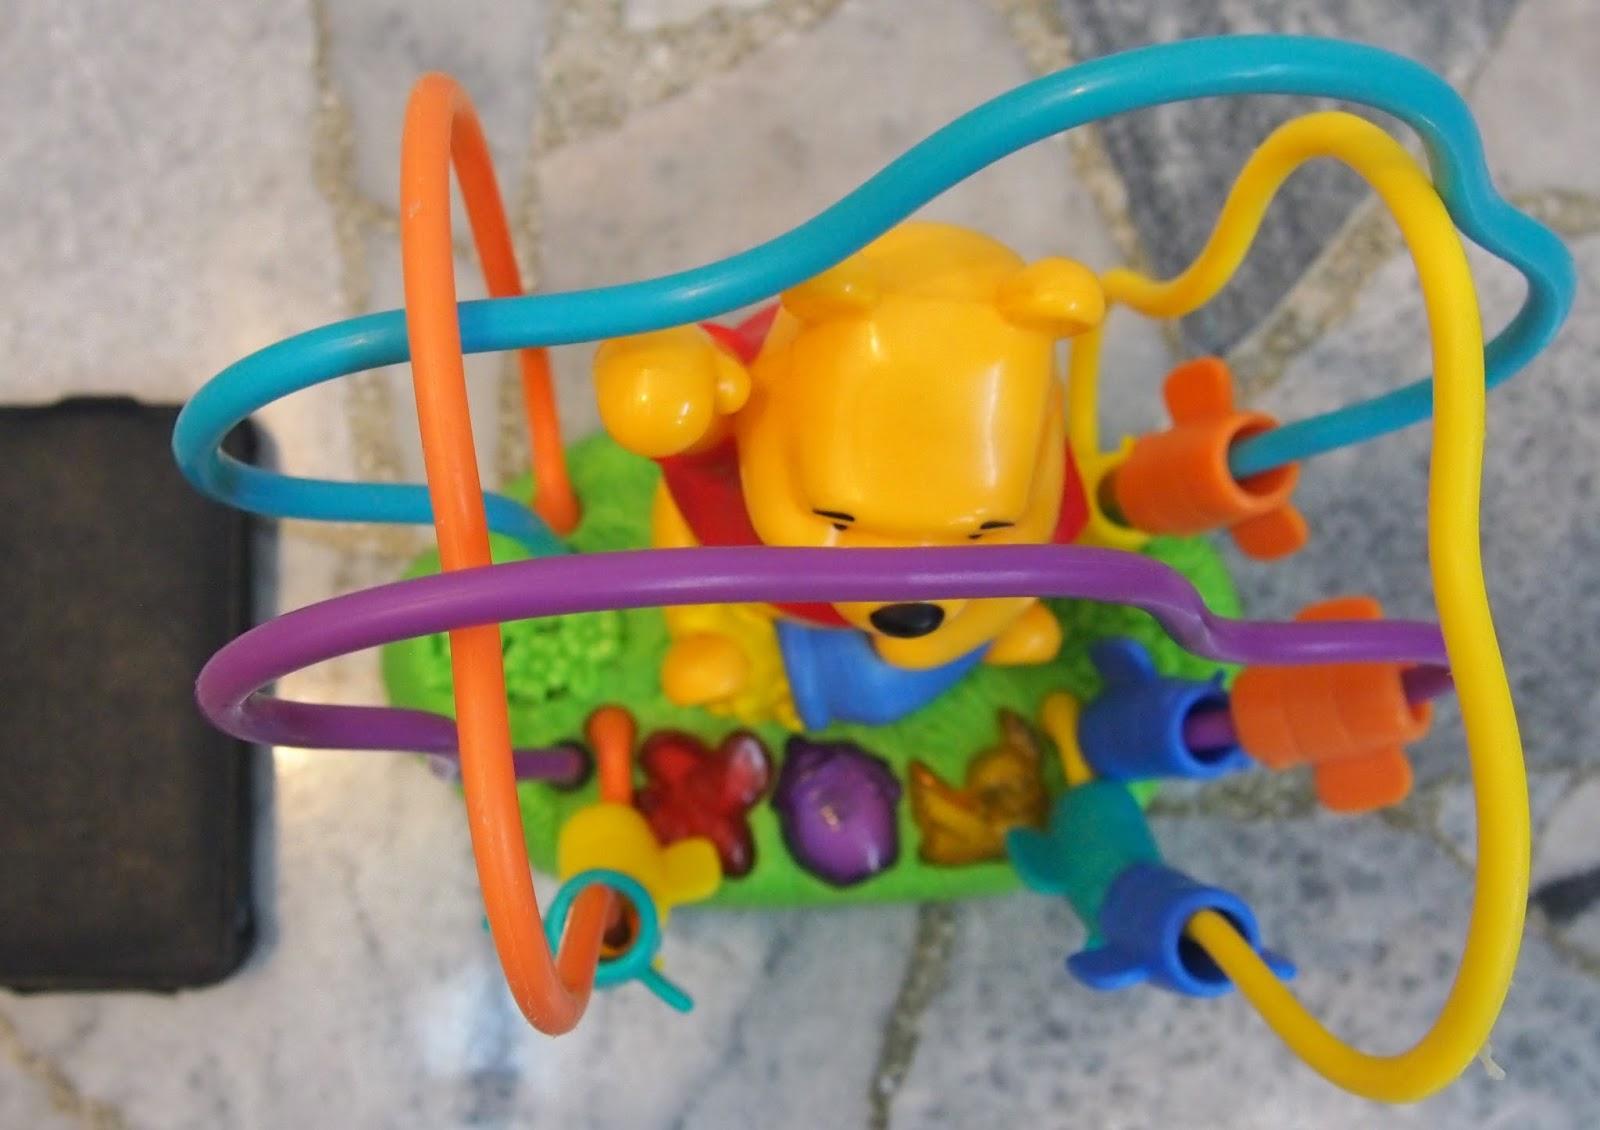 Juaimurah Fisher Price Winnie The Pooh Bead Maze Toy With